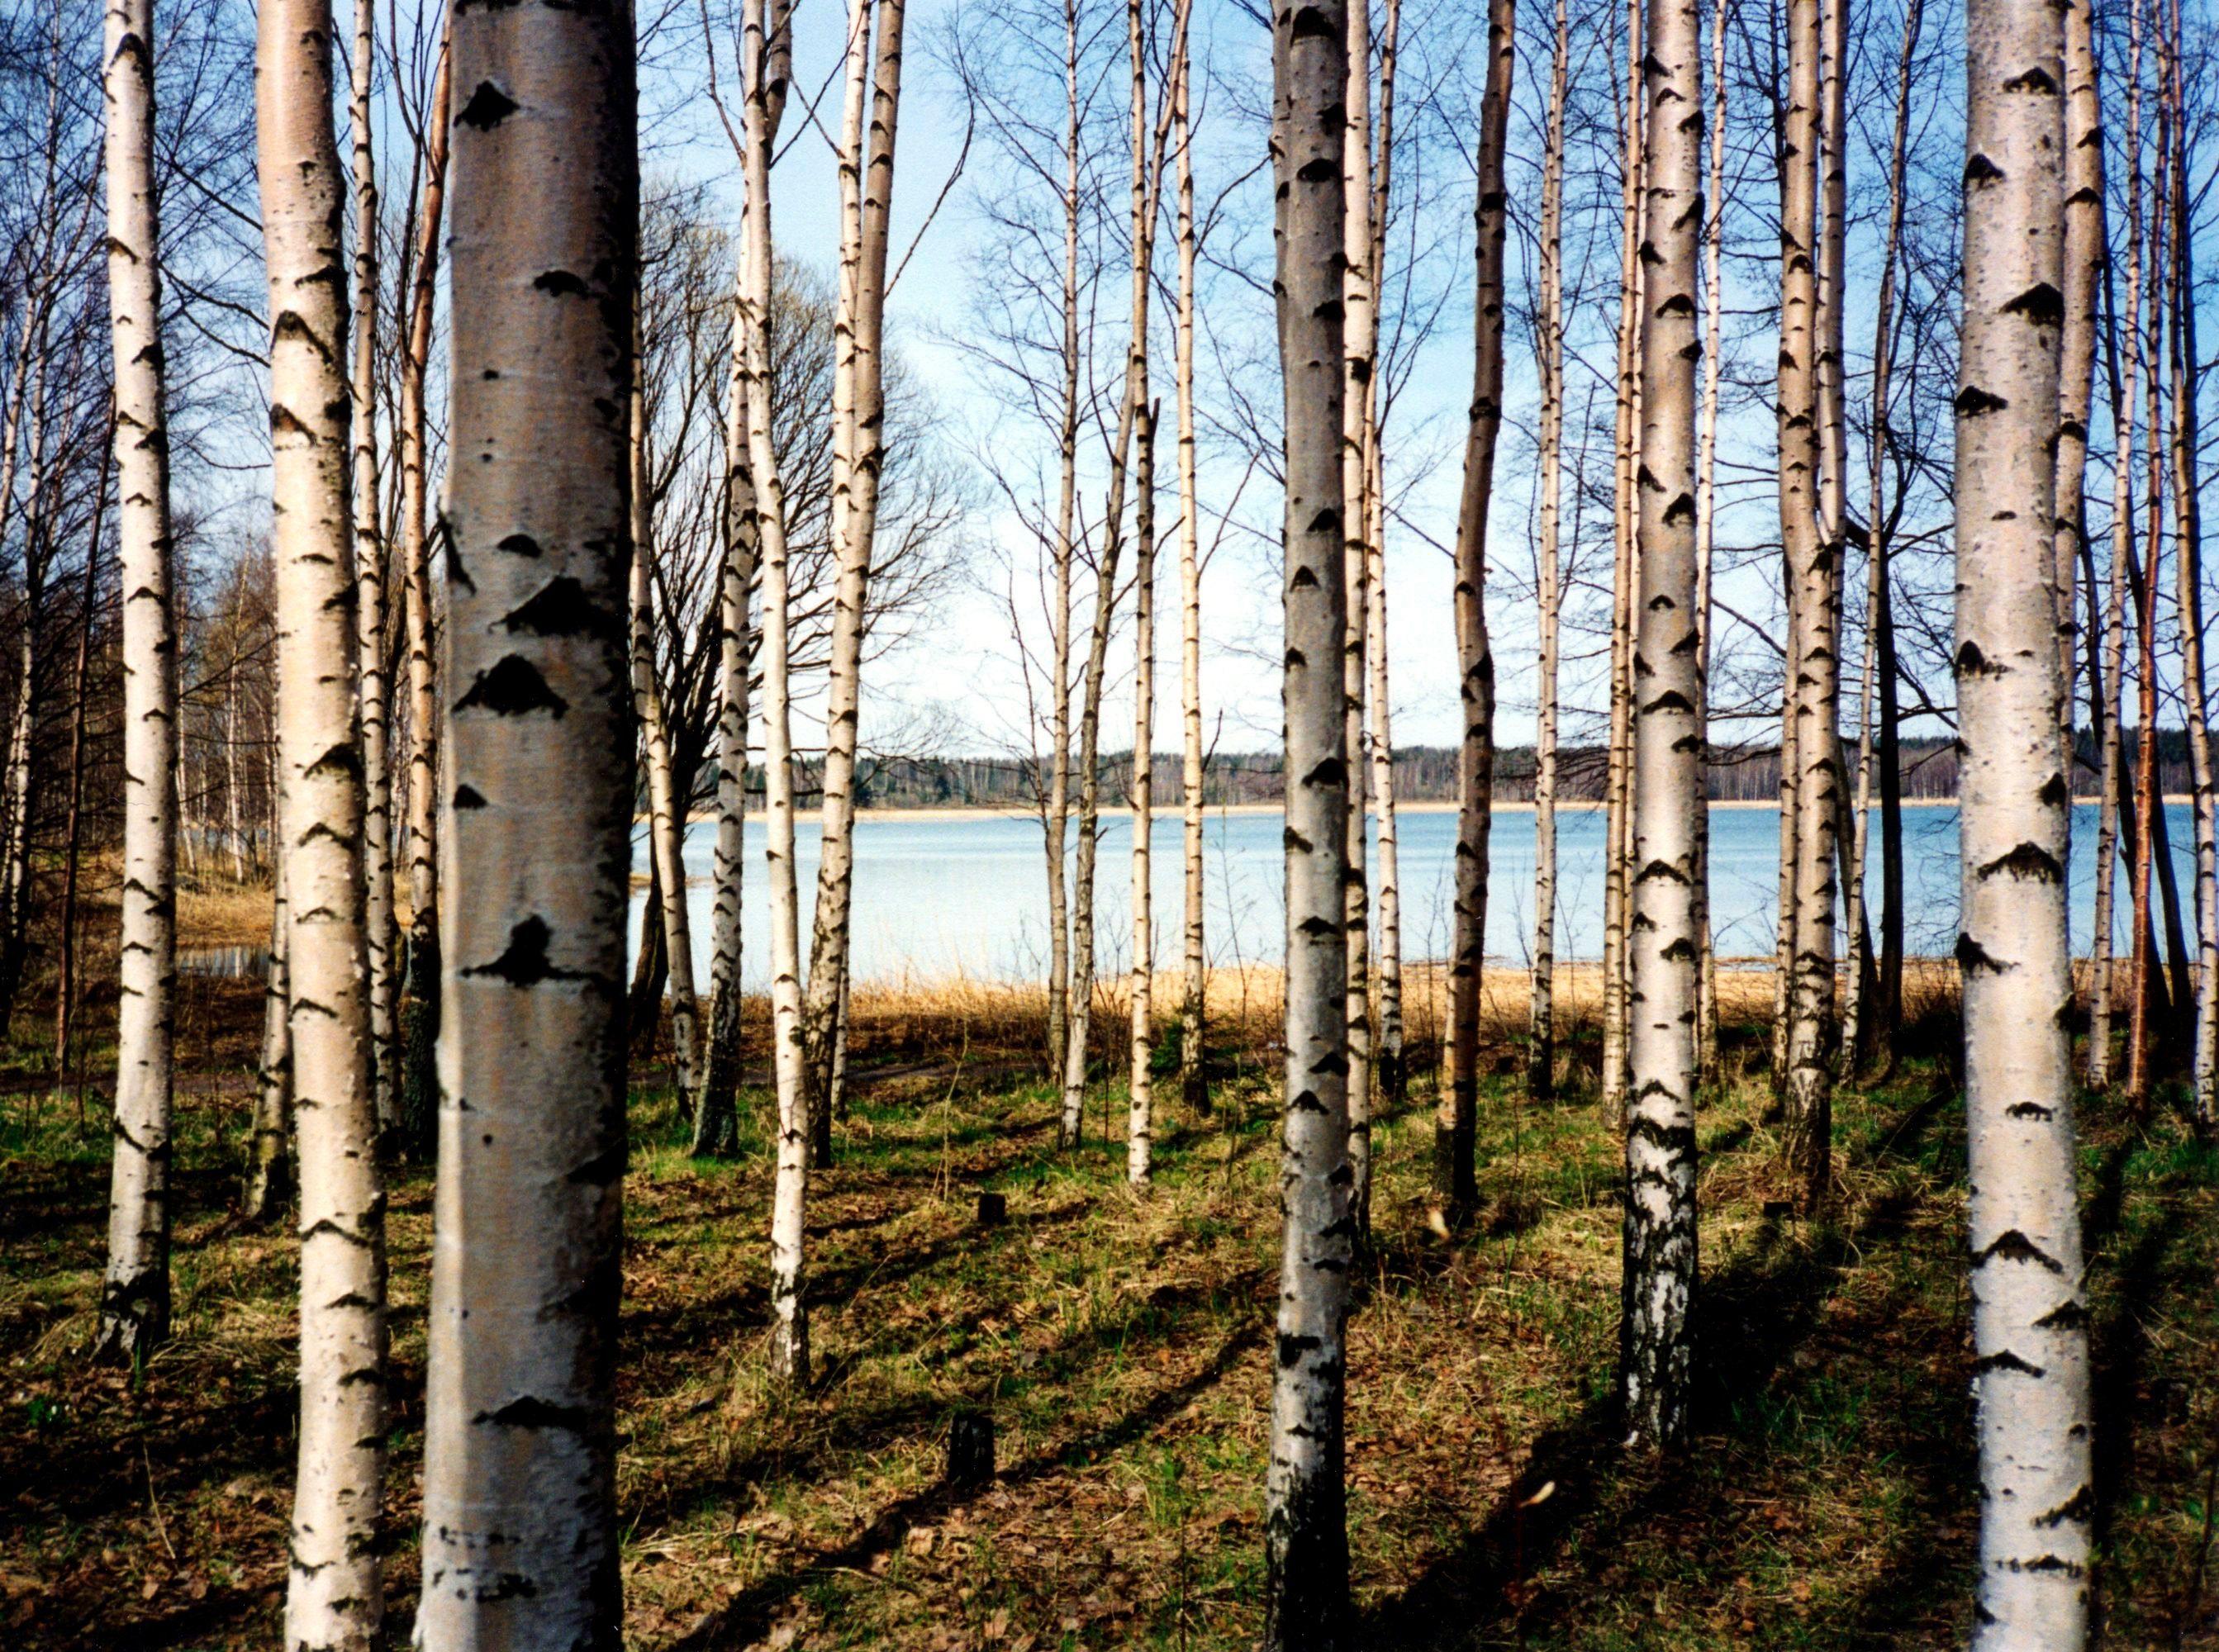 PAPERMOON Fototapete »Finnish Forest of Birch Trees«, BlueBack, 7 Bahnen, 350 x 260 cm